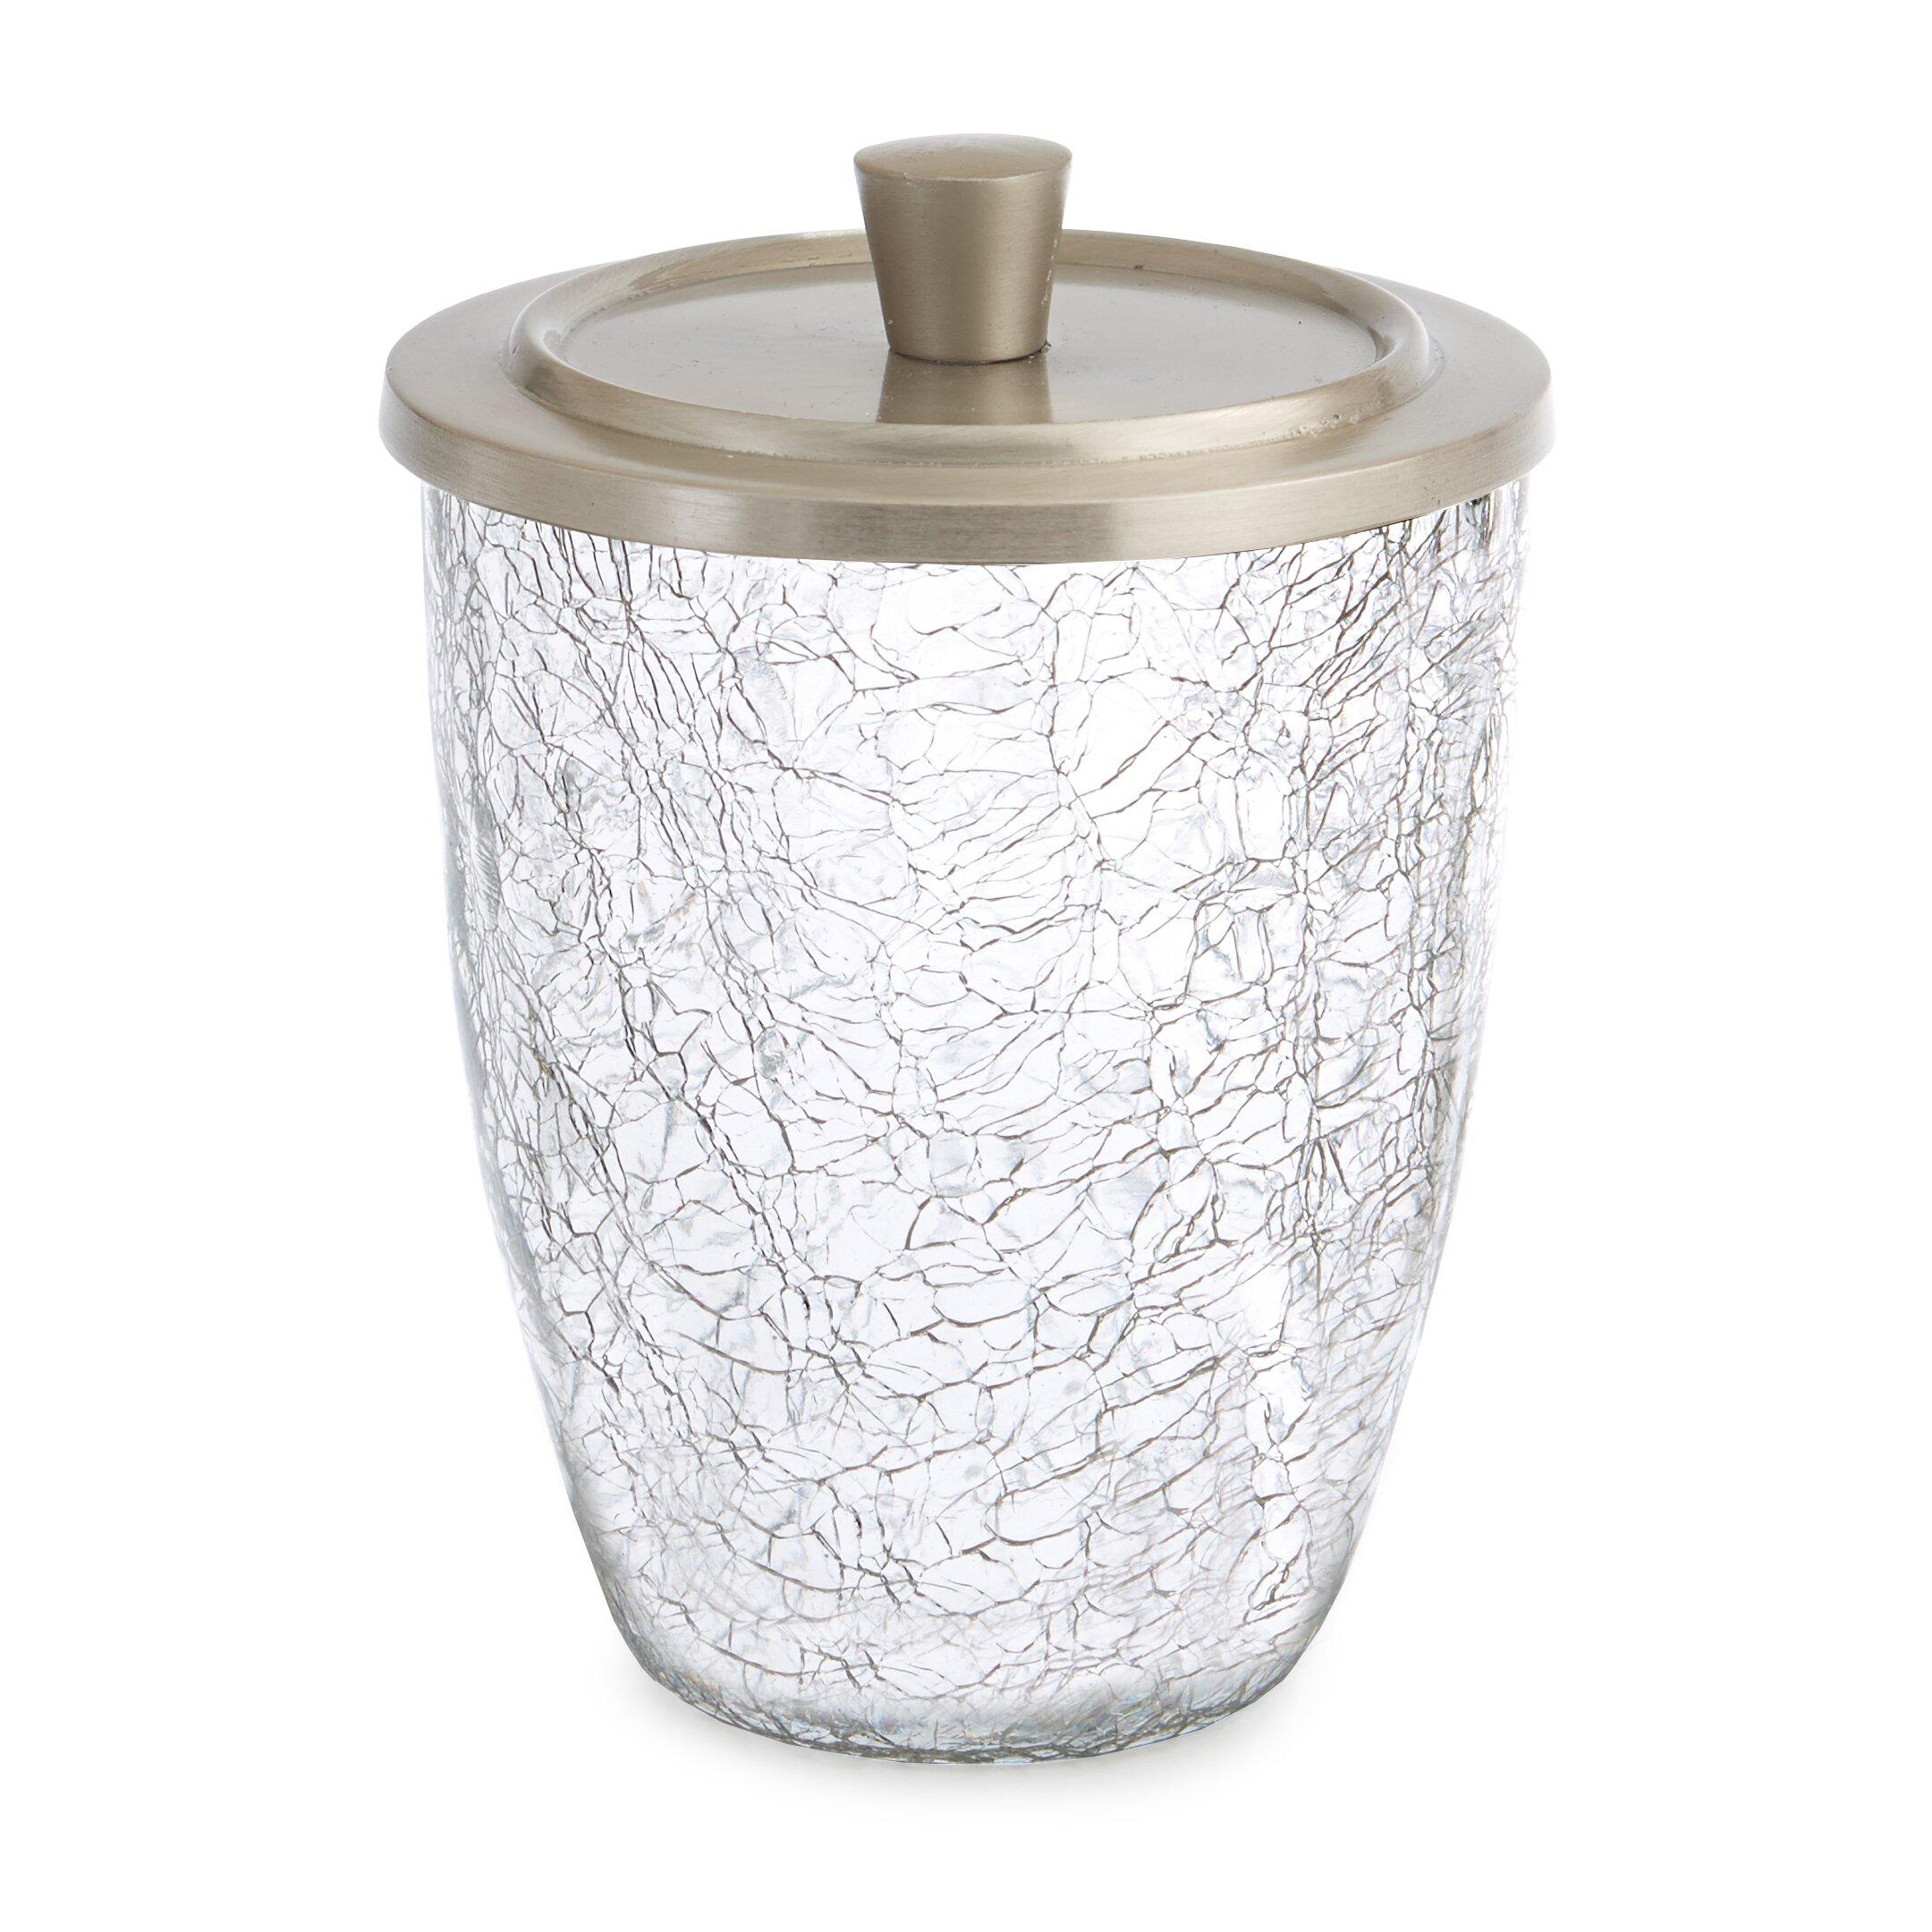 Paradigm trends heirloom crackle 7 piece bathroom for Crackle glass bathroom set